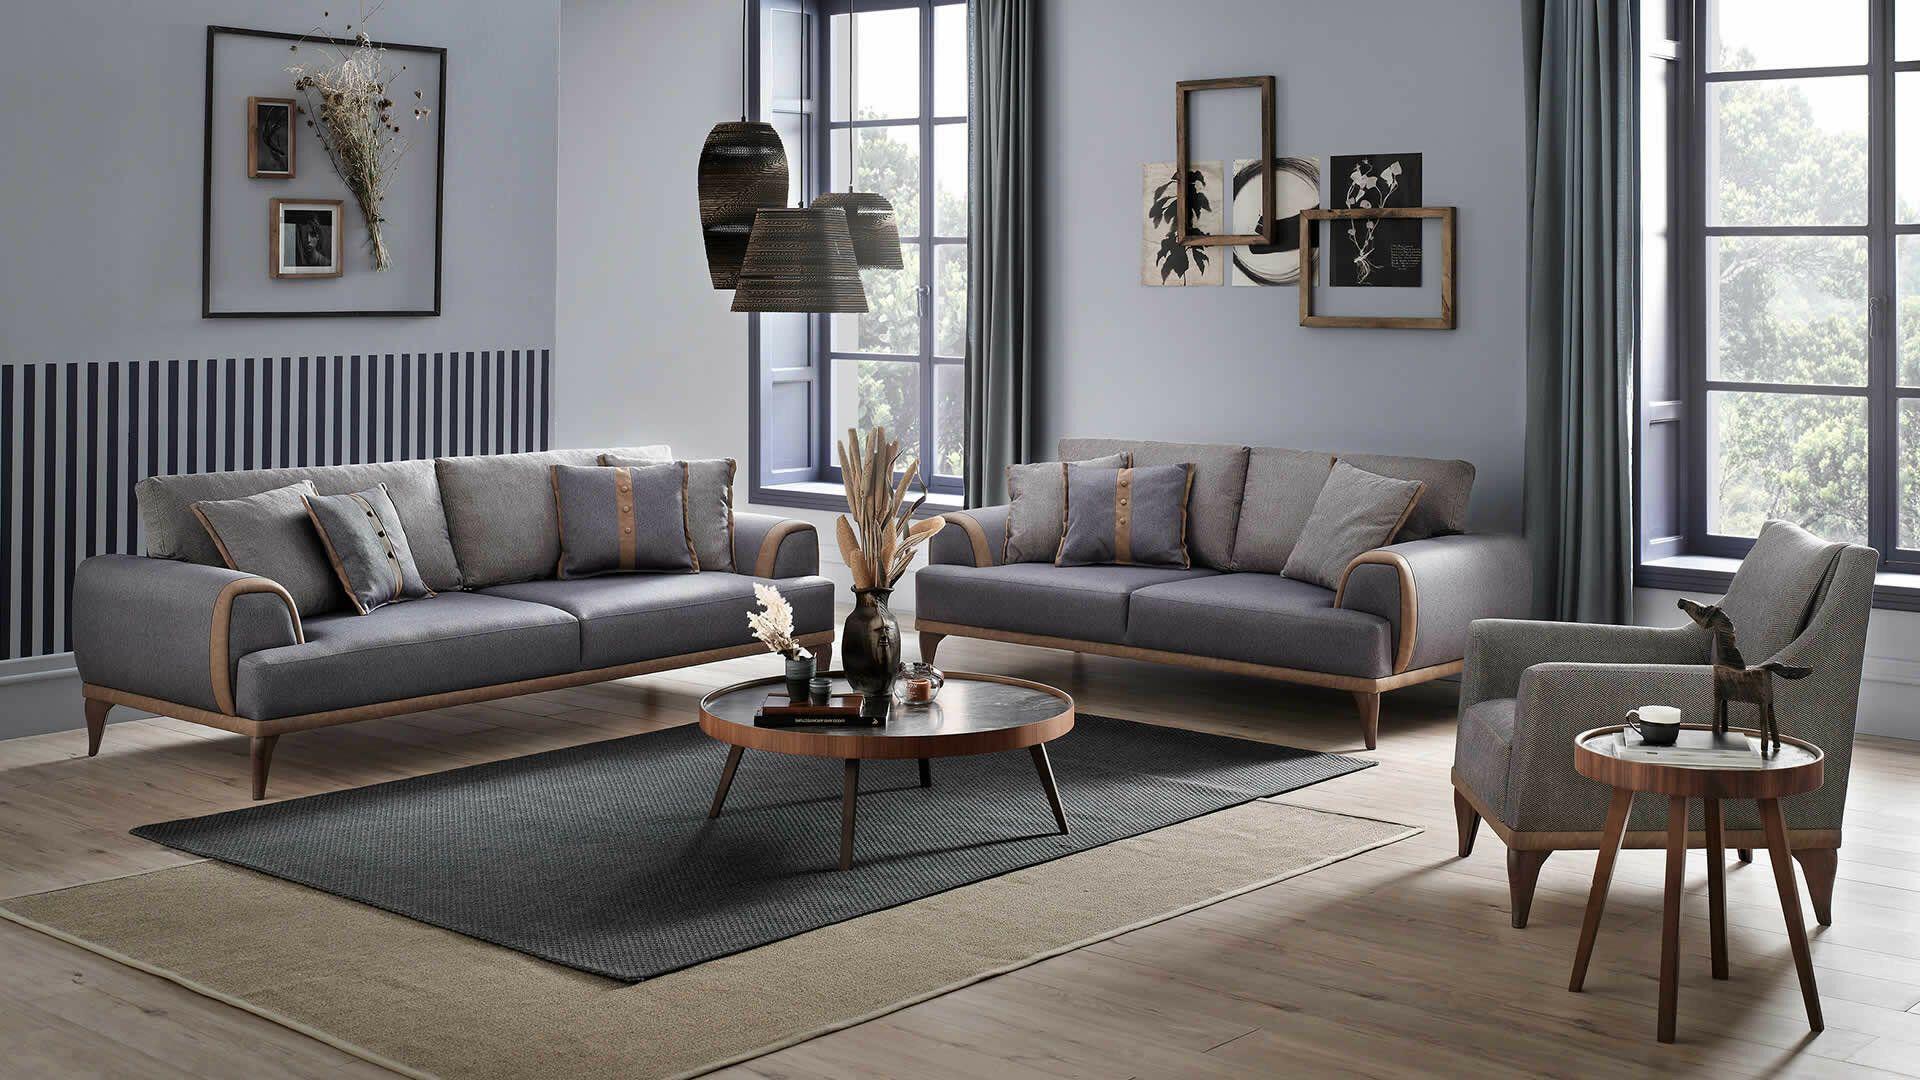 Dogtas Miranda Ikili Yatakli Koltuk Mobilya Decoration Homedecoration Furniture 2020 Mobilya Fikirleri Koltuklar Mobilya